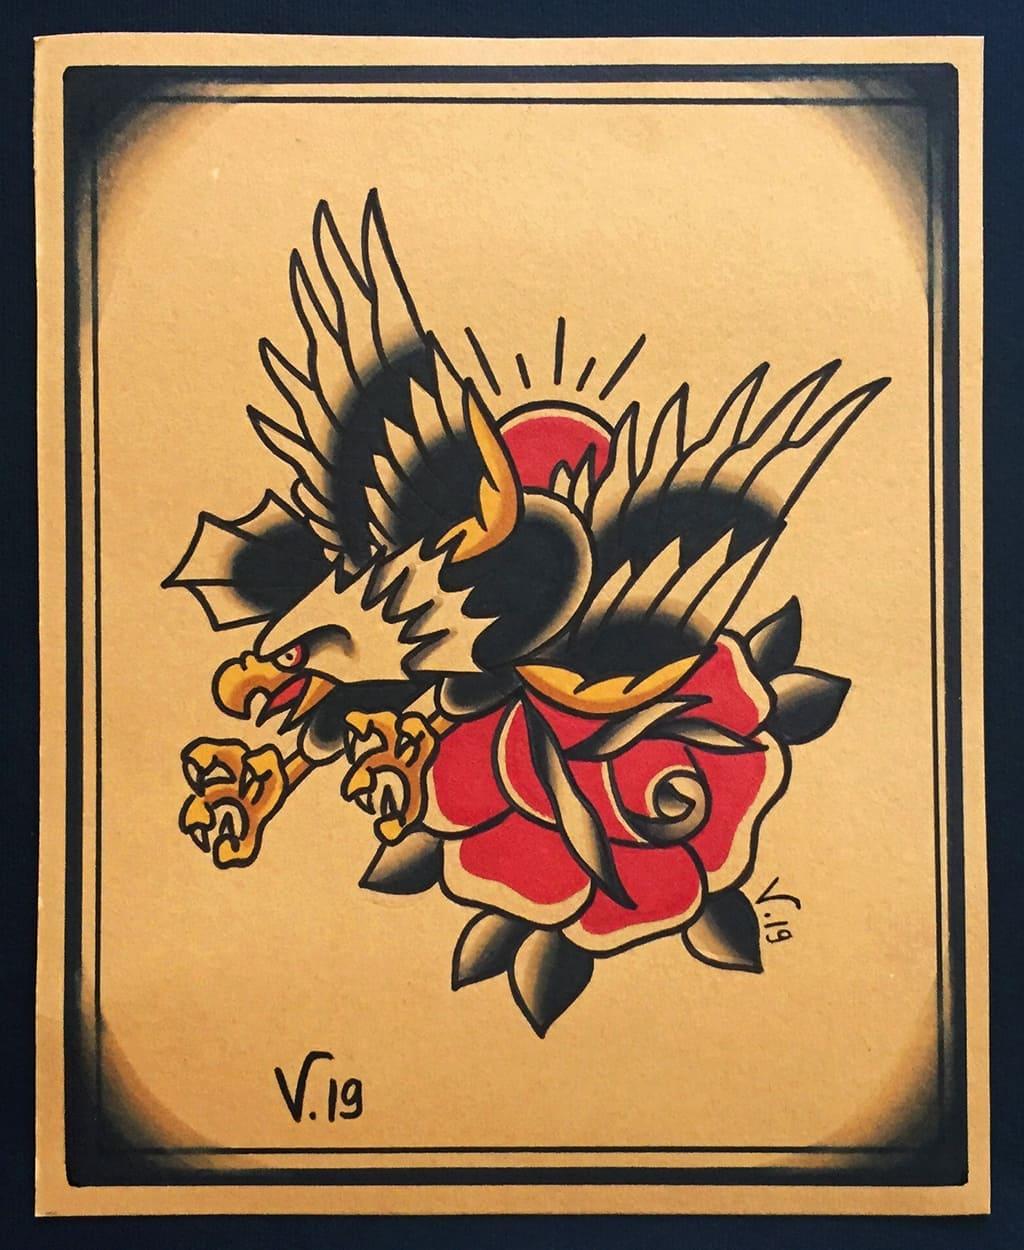 oldschool eagle and rose |flash tattoo como|vittoriatattoo